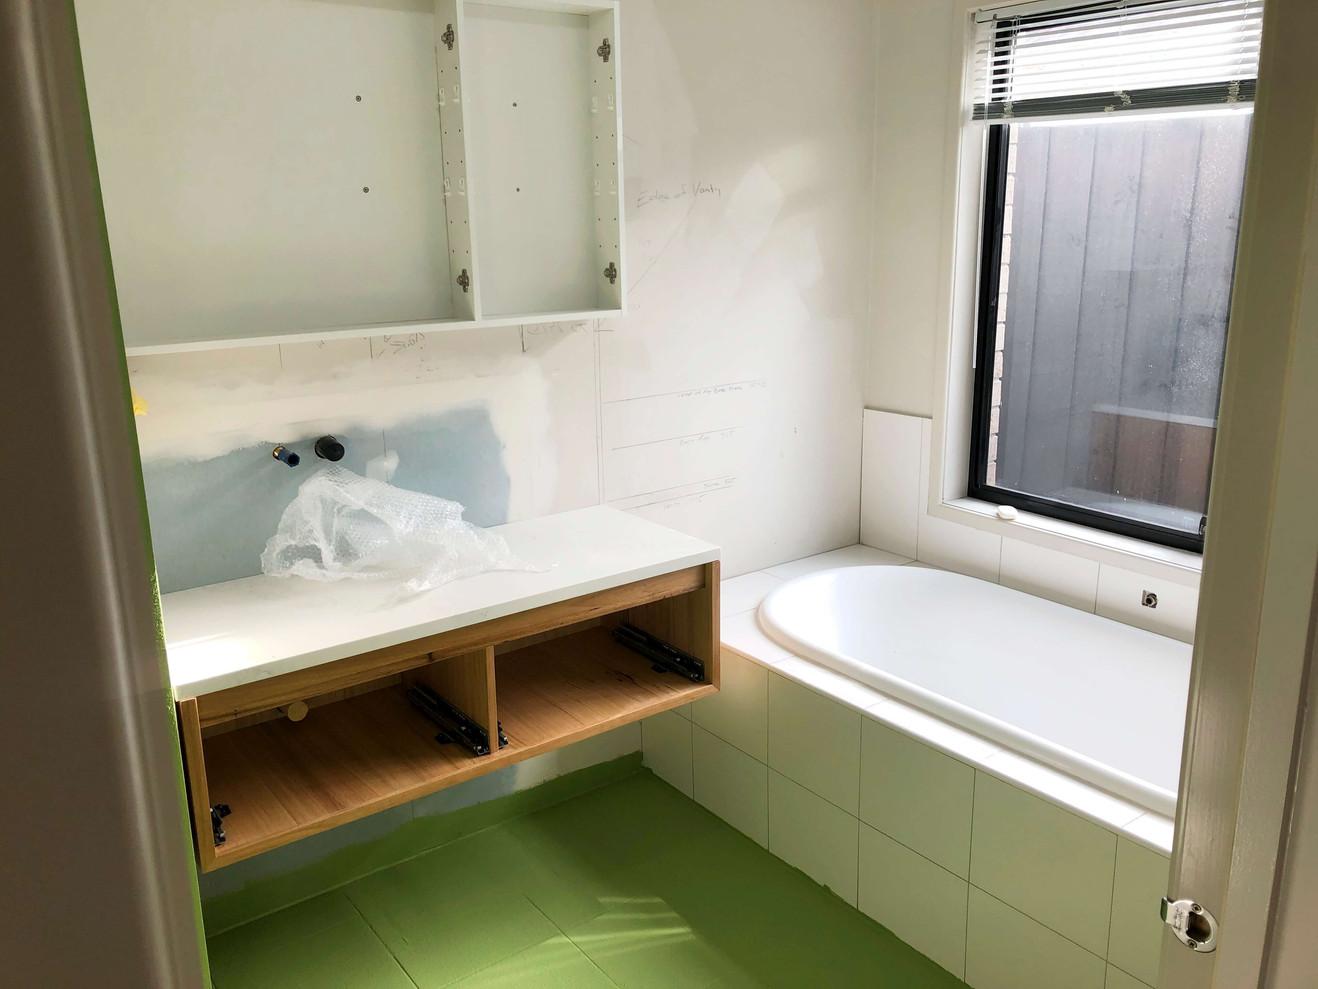 (TYLR) Bathroom (WEB).jpg